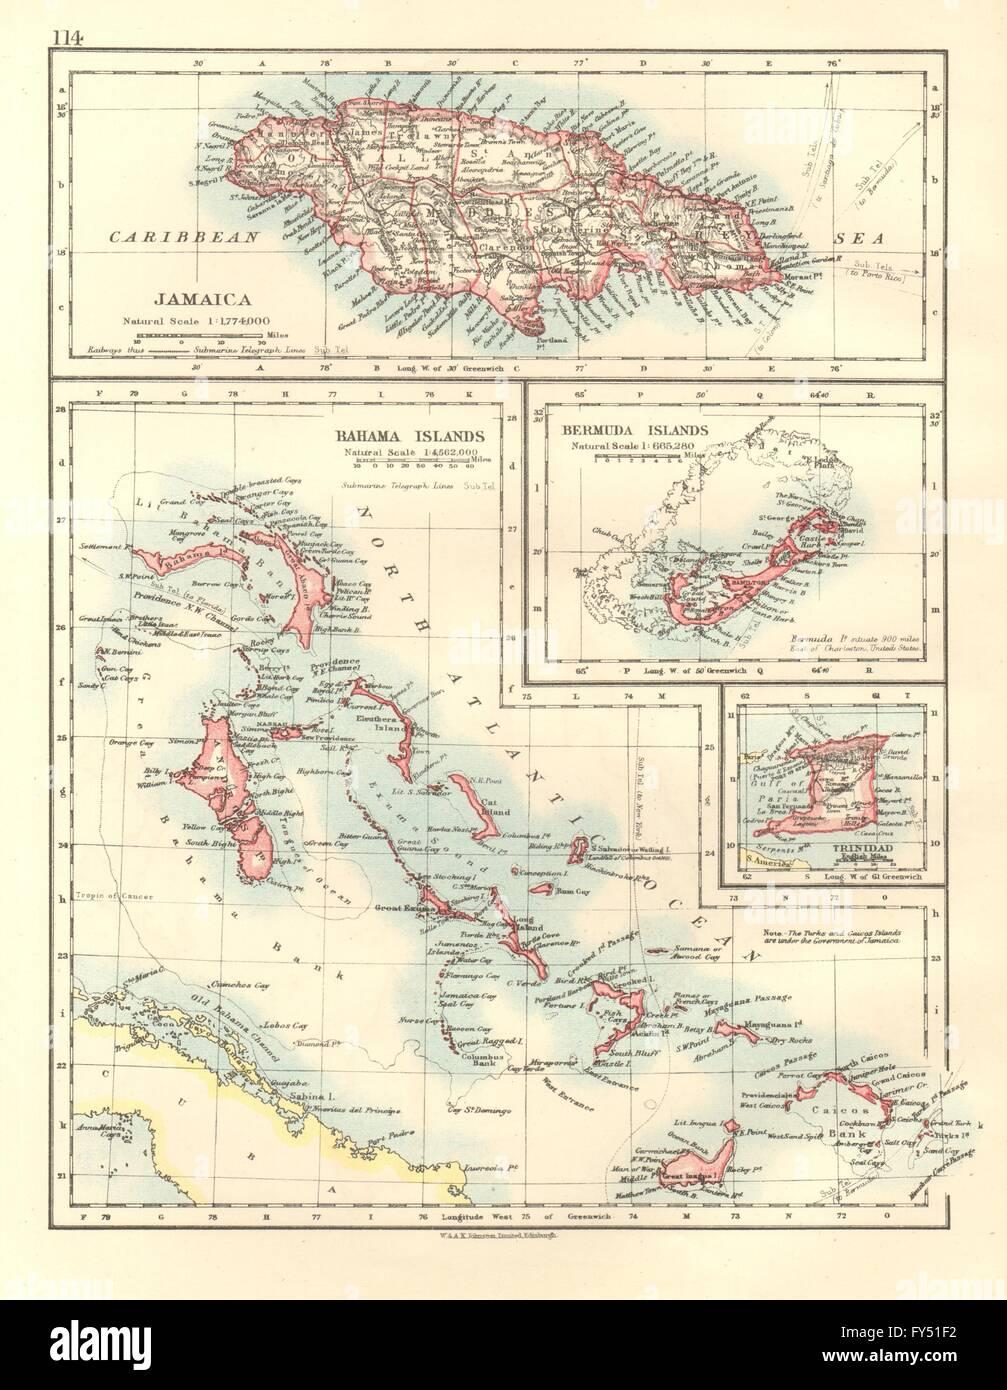 Caribbeanatlantic islandsjamaica bermuda bahamas trinidad stock jamaica bermuda bahamas trinidad johnston 1920 map gumiabroncs Image collections